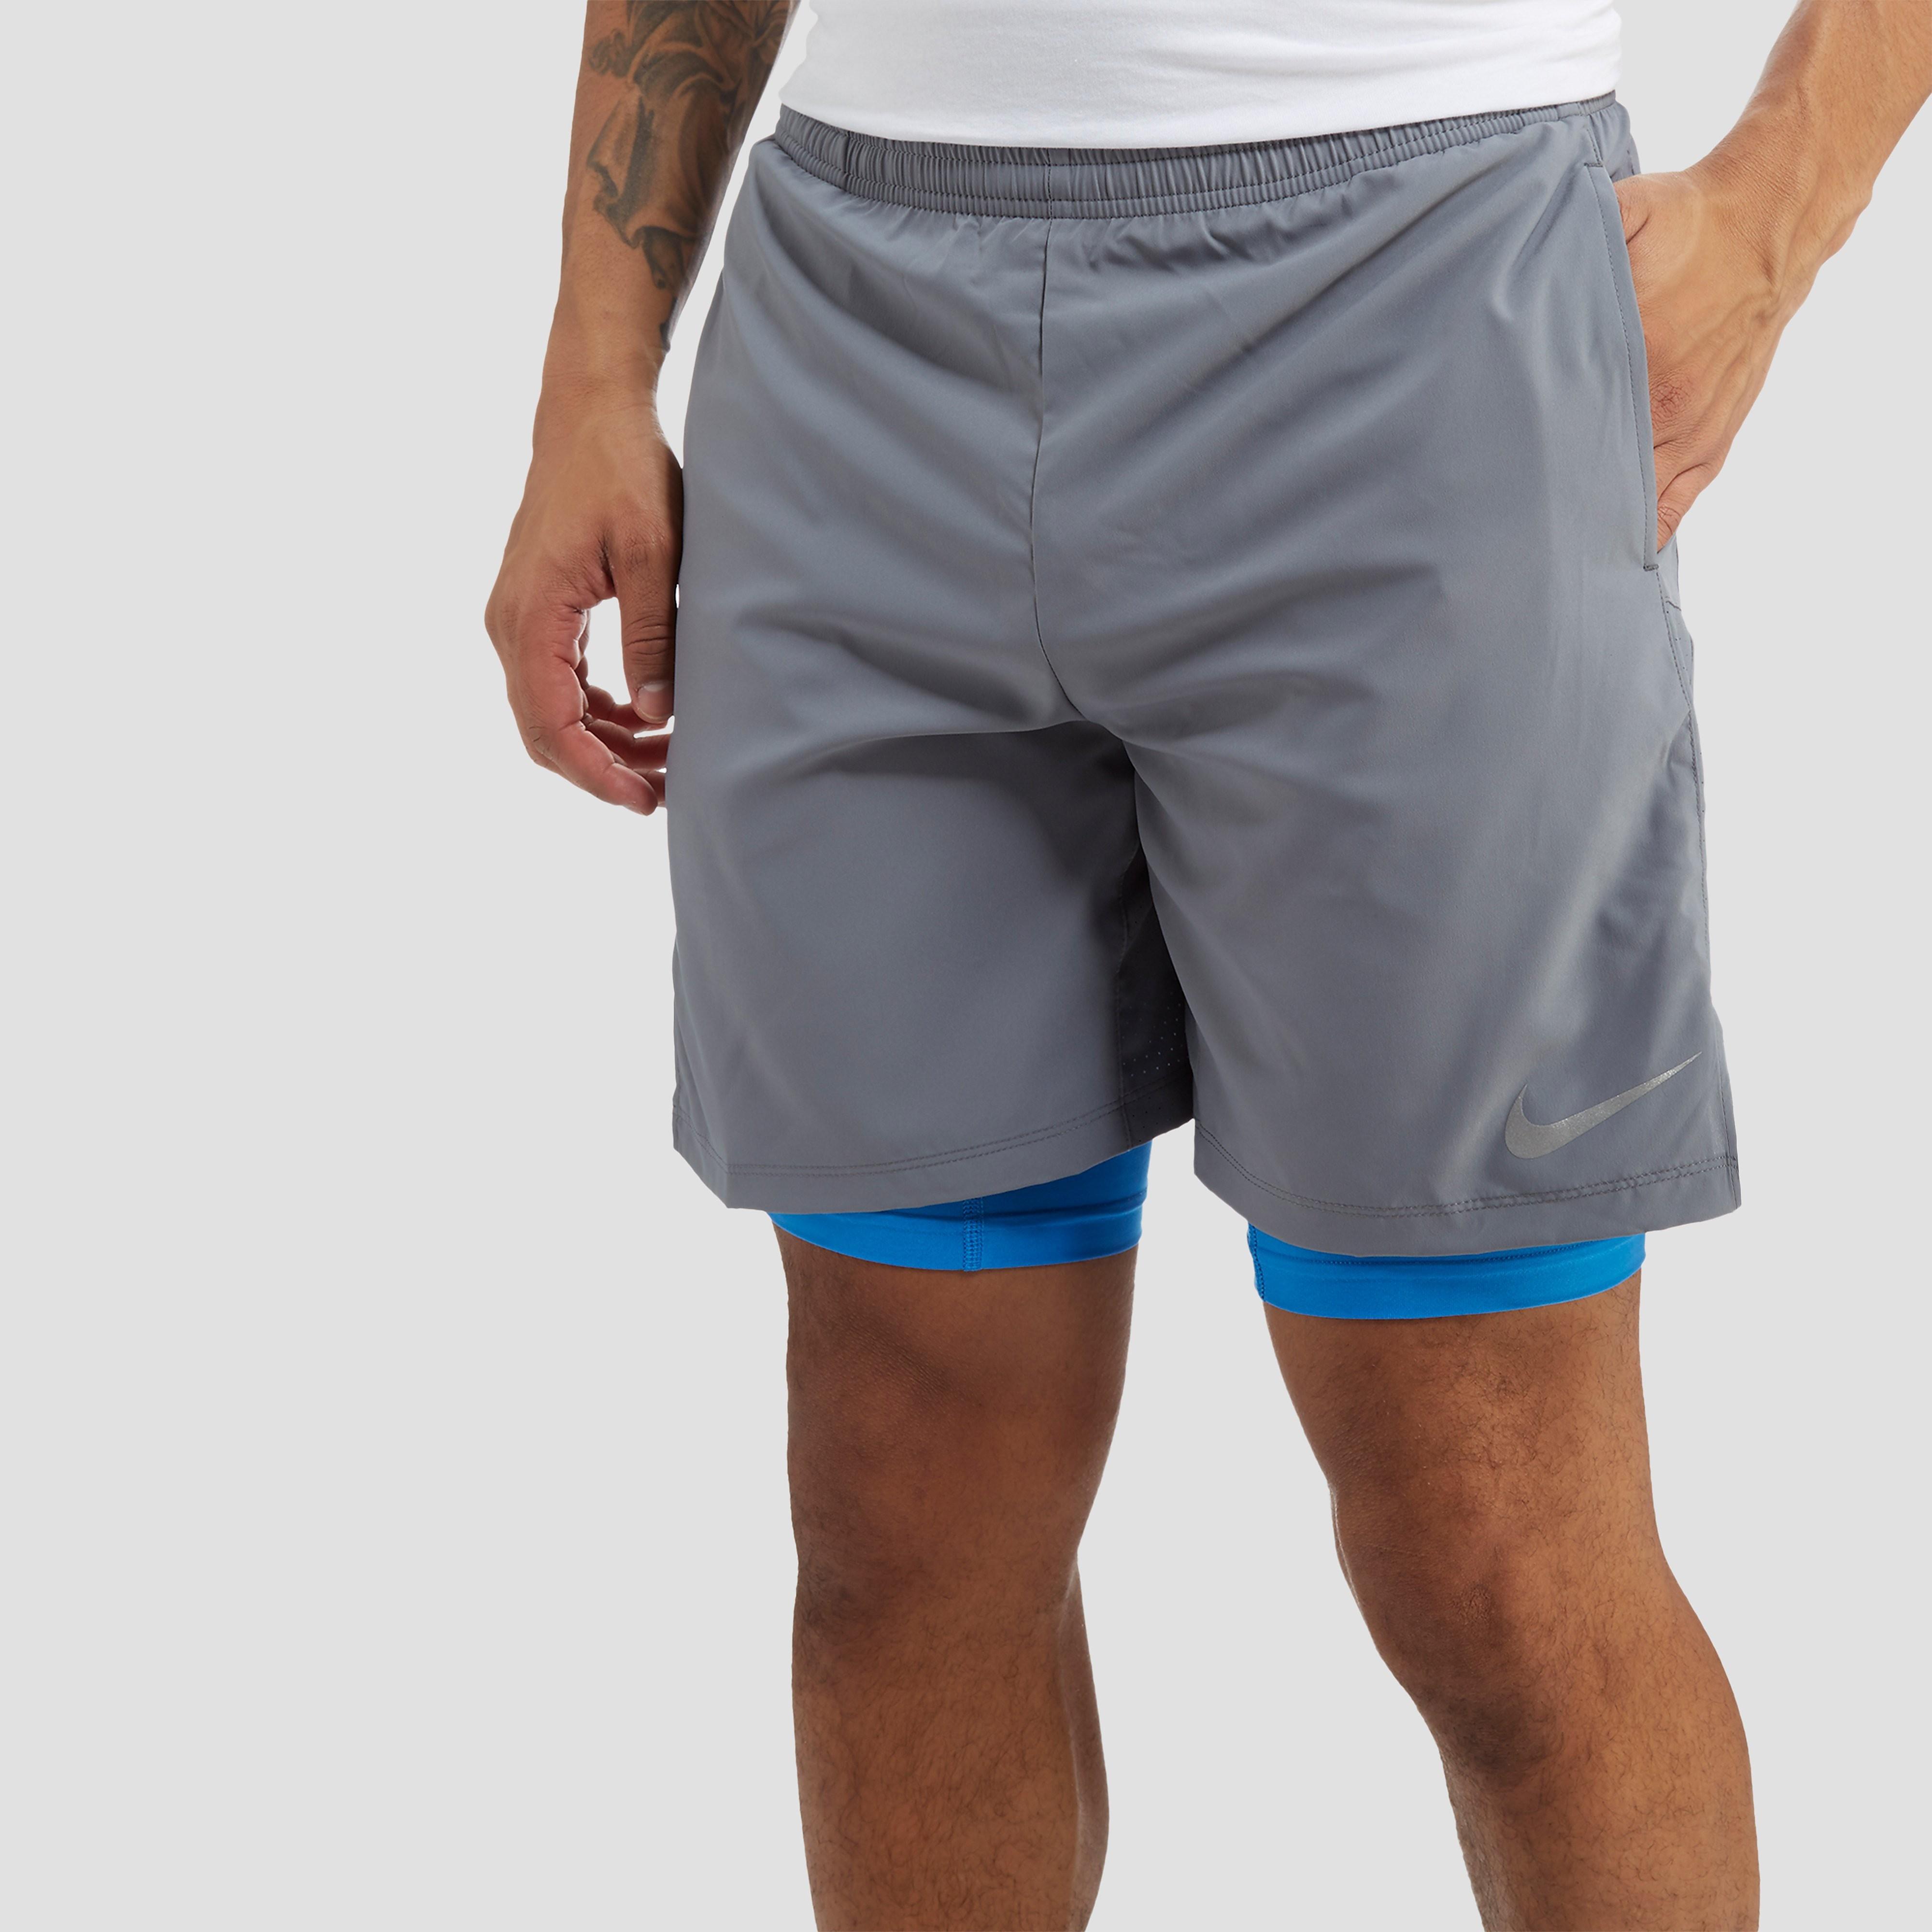 Nike Challenger 2 in 1 Men's Shorts